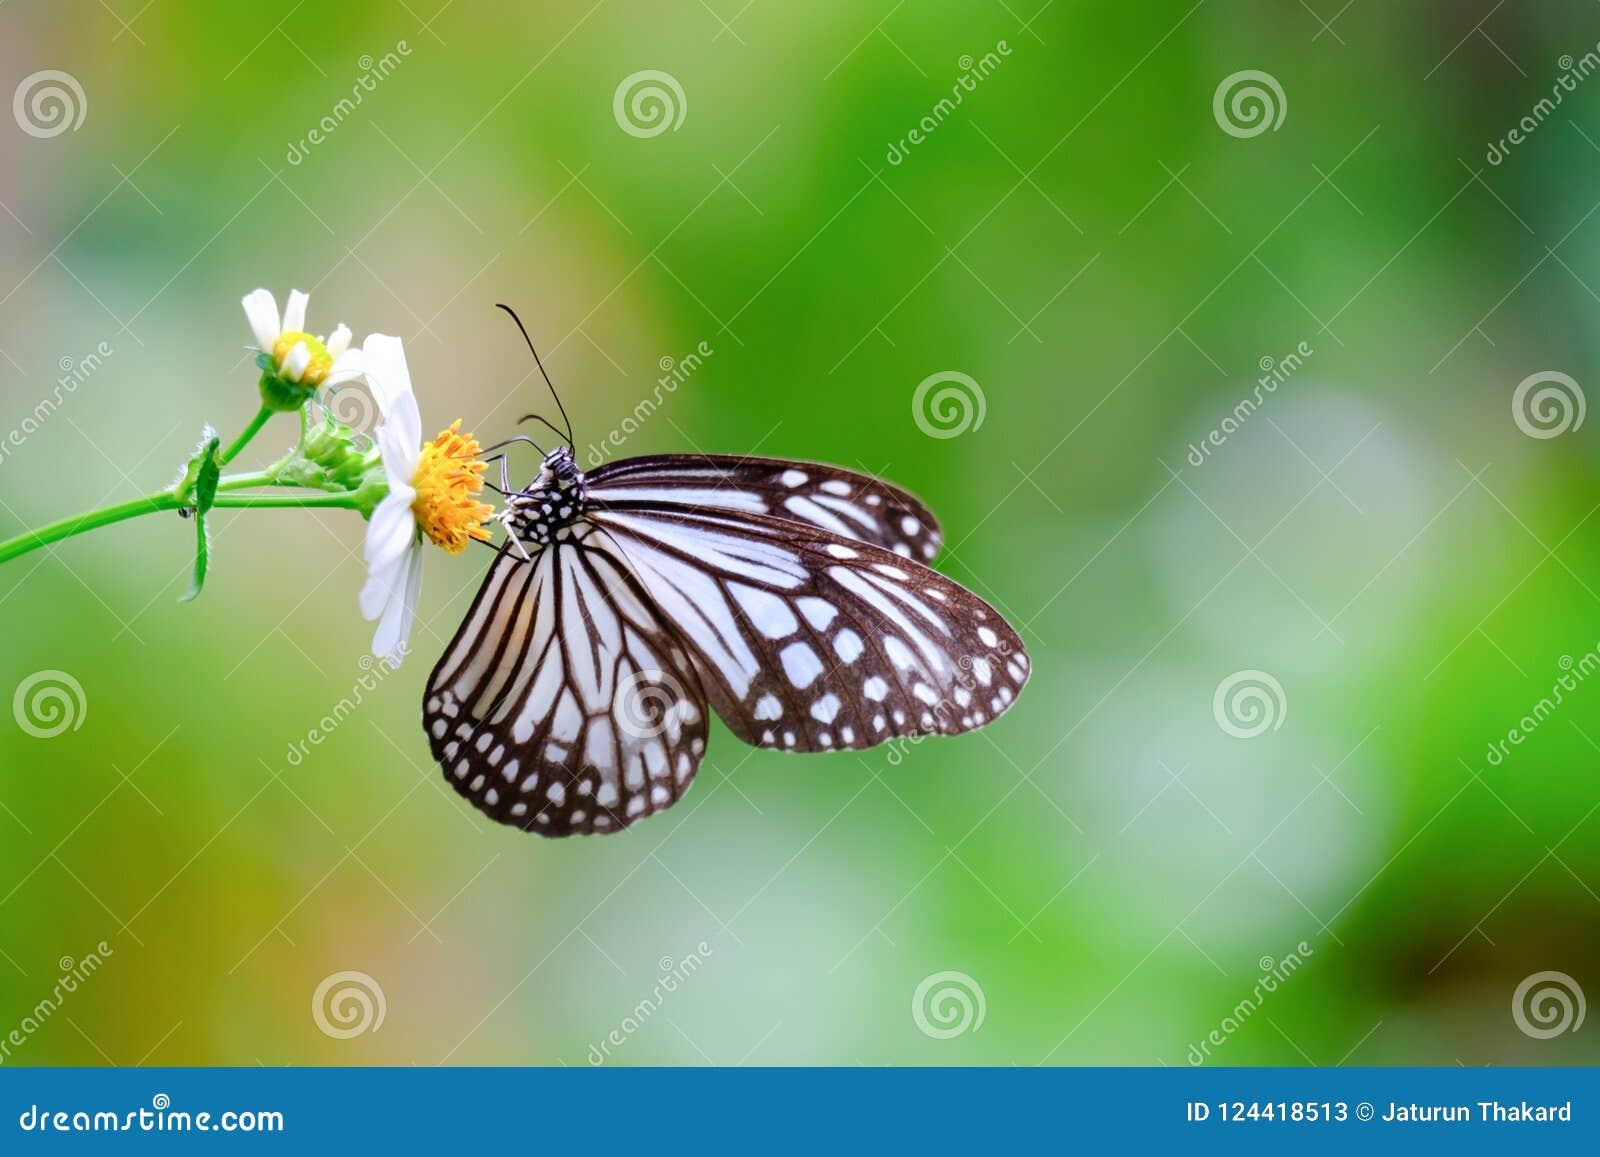 Mariposa vidriosa común del tigre del primer